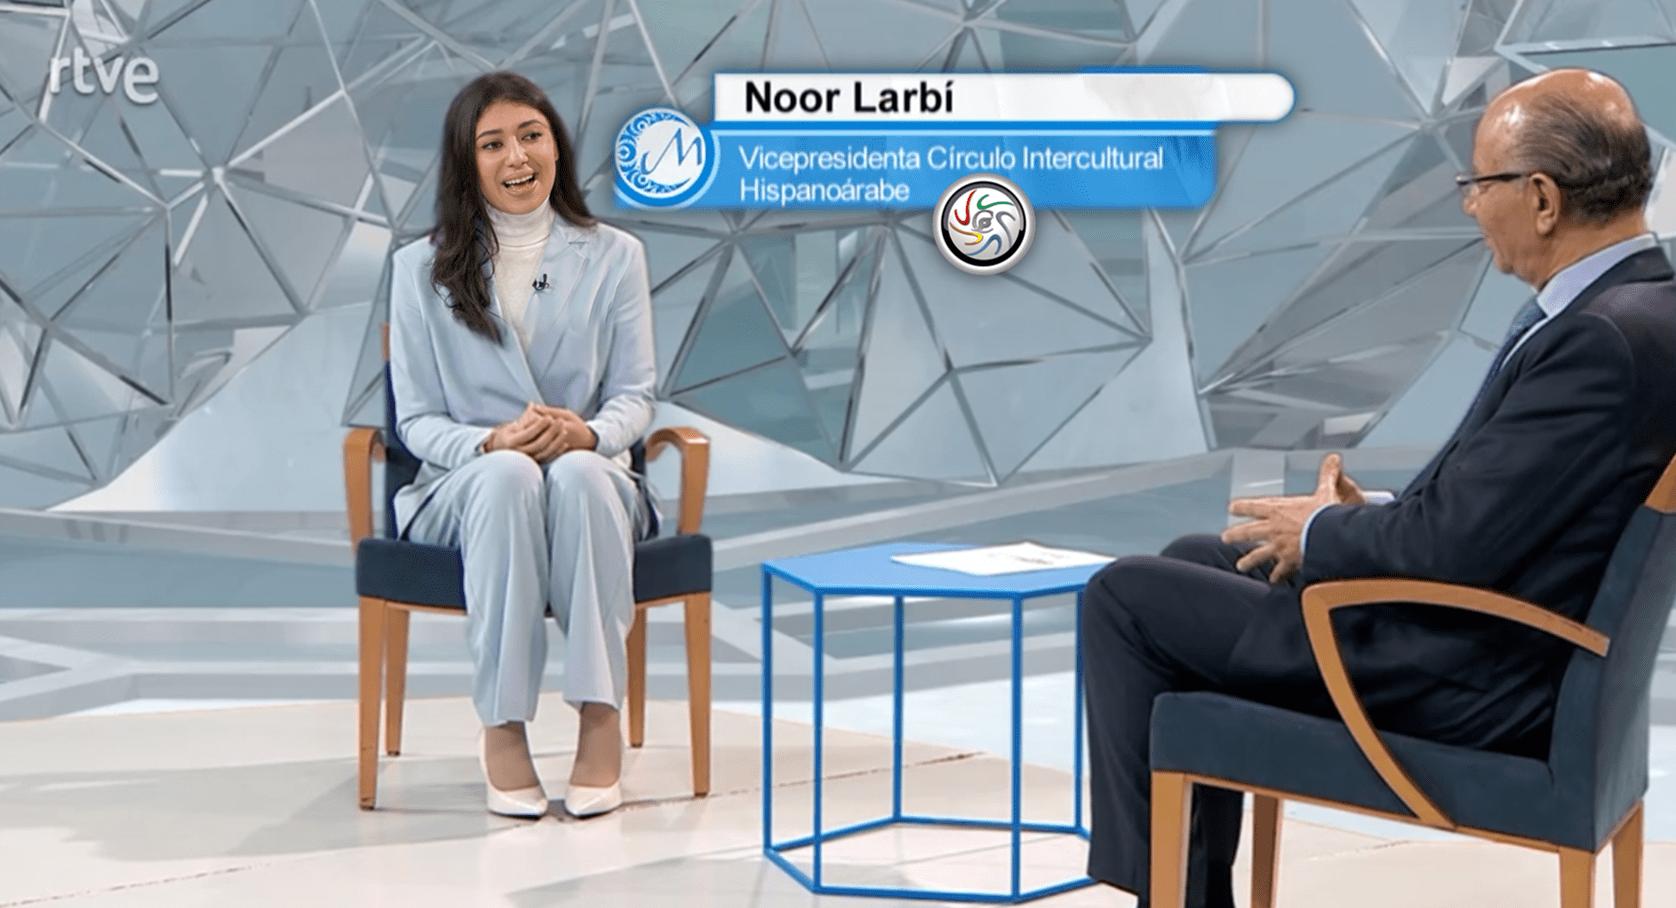 Programa Medina de TVE2 entrevistó a nuestra Vicepresidenta, Nour Larbi